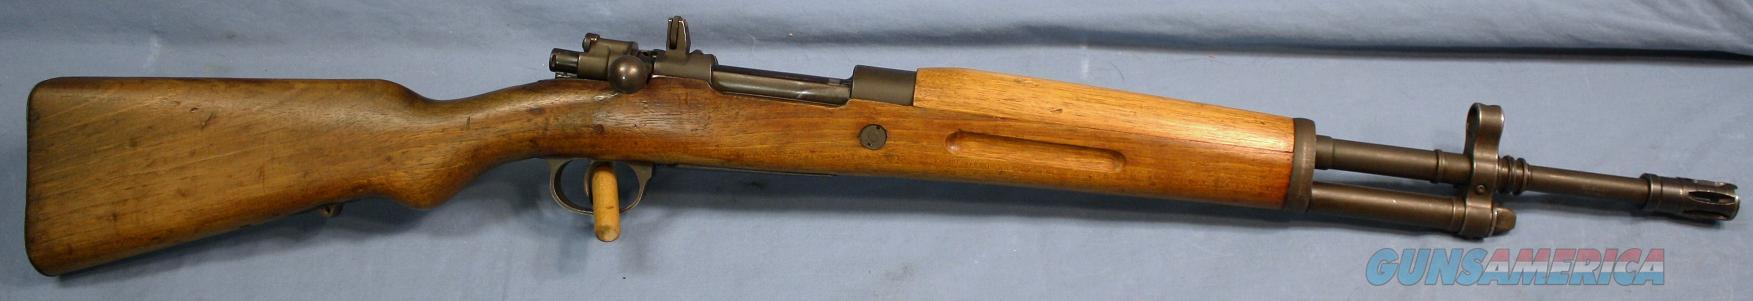 CHILEAN 1935 MAUSER CARBINE | Simpson Ltd